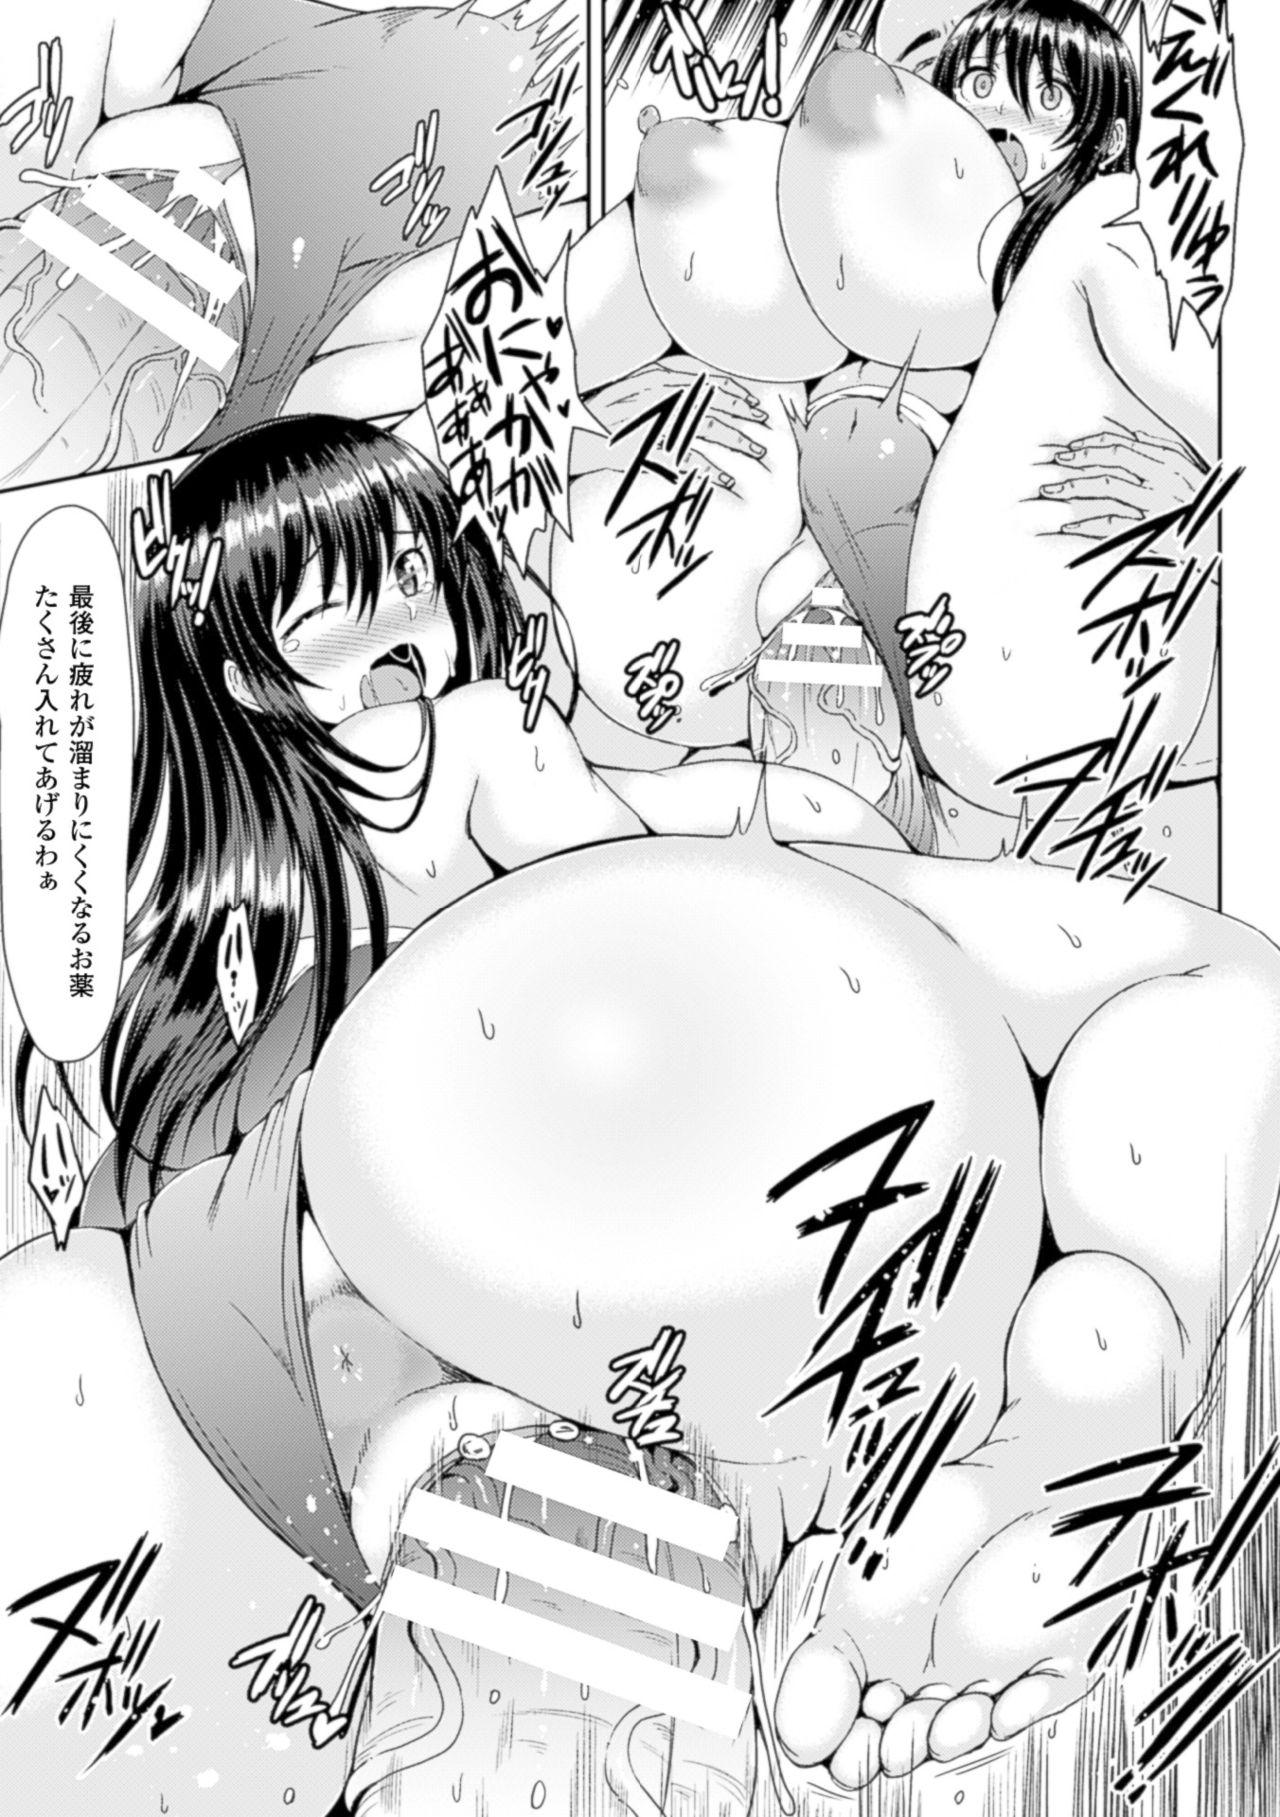 2D Comic Magazine Seikan Massage de Kyousei Etsuraku Detox! Vol. 2 38